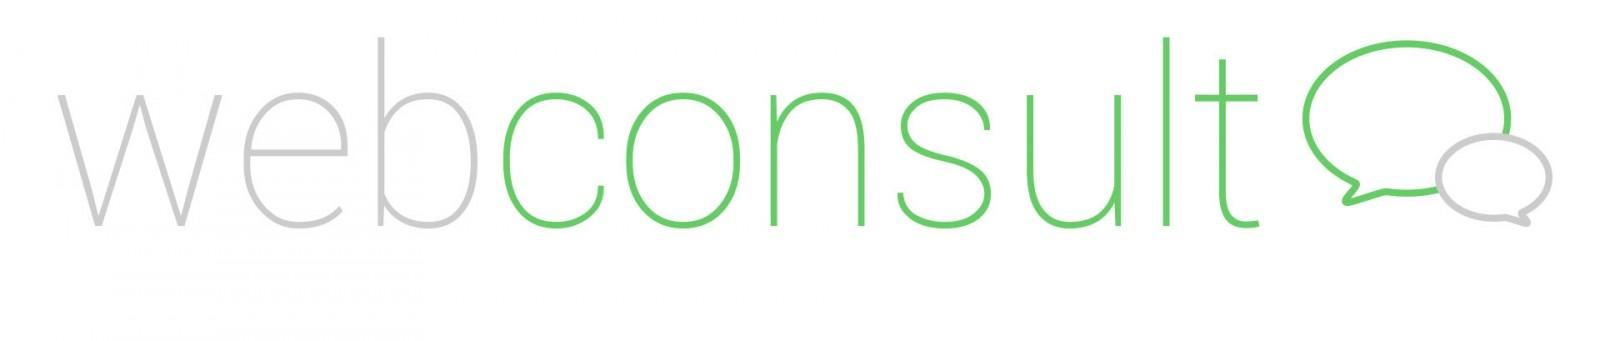 web-consult-logo